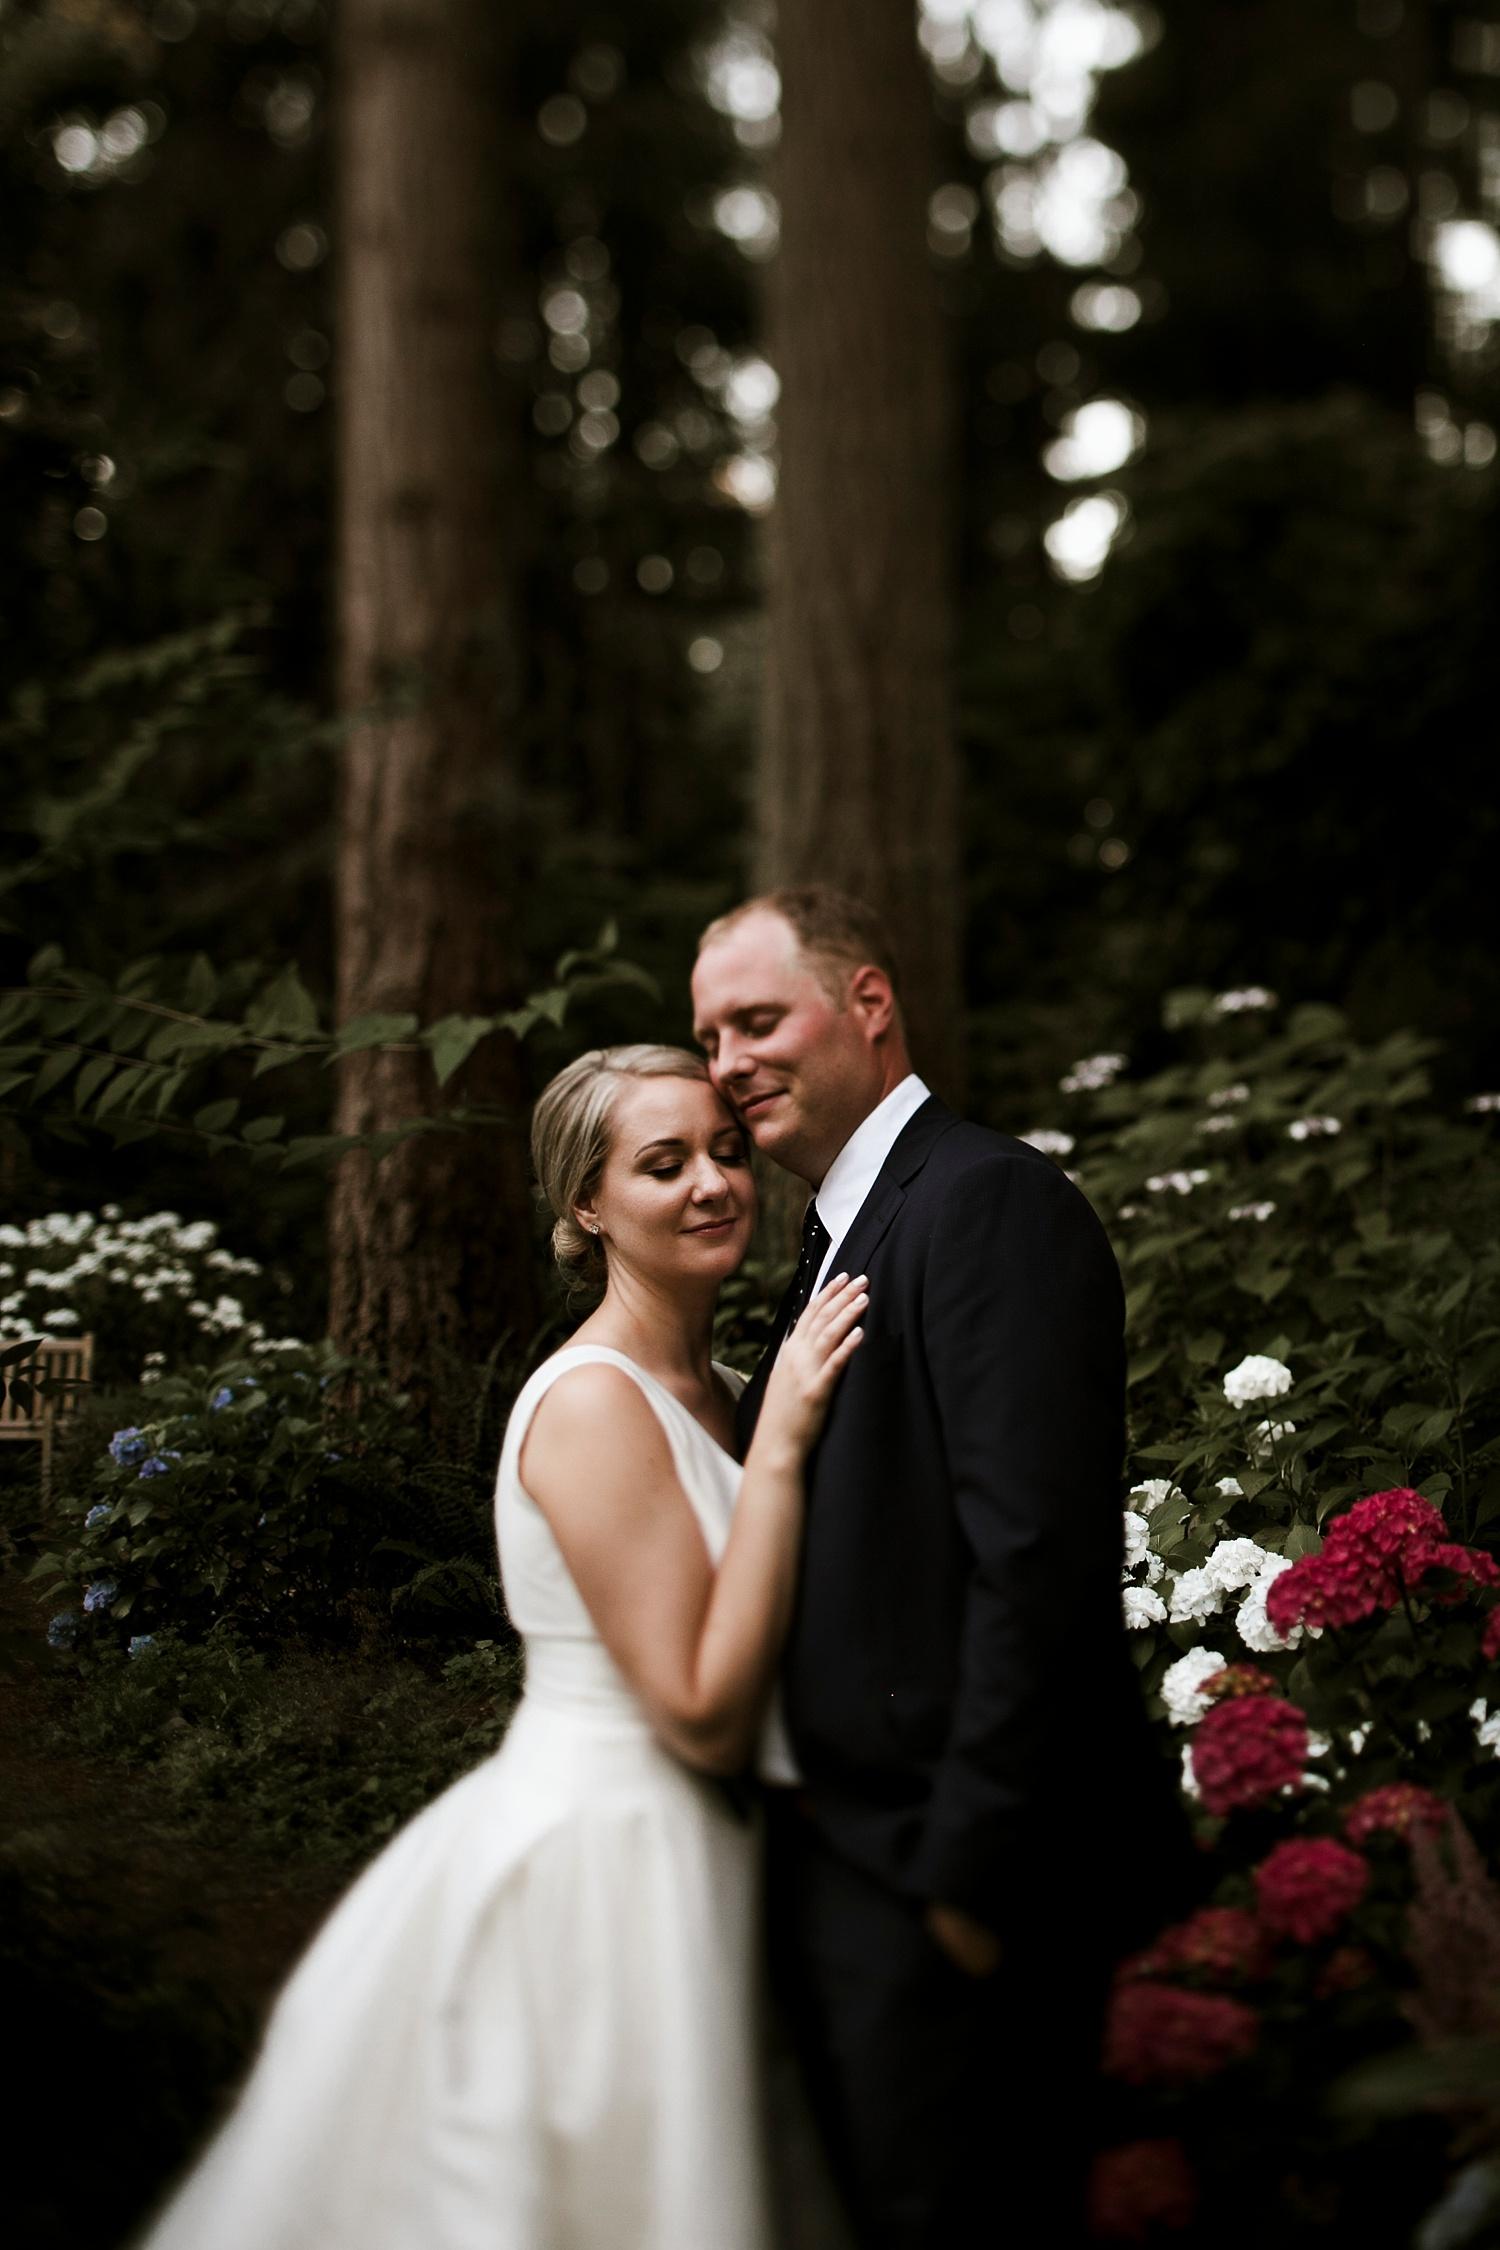 san francisco wedding photographer_052.JPG